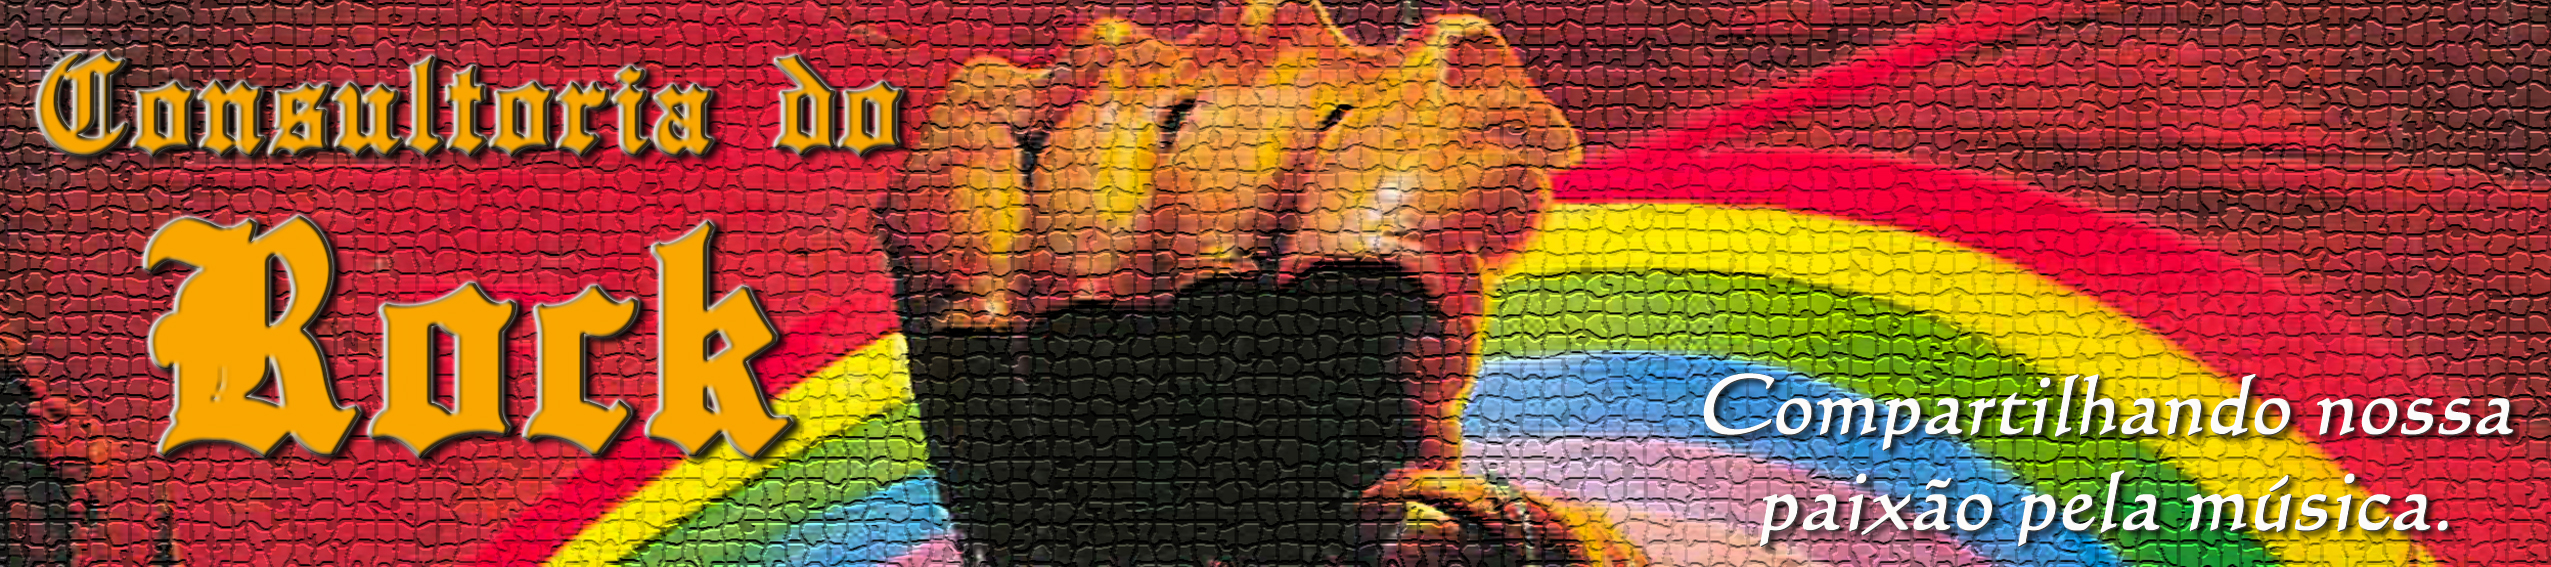 banner rainbow copy